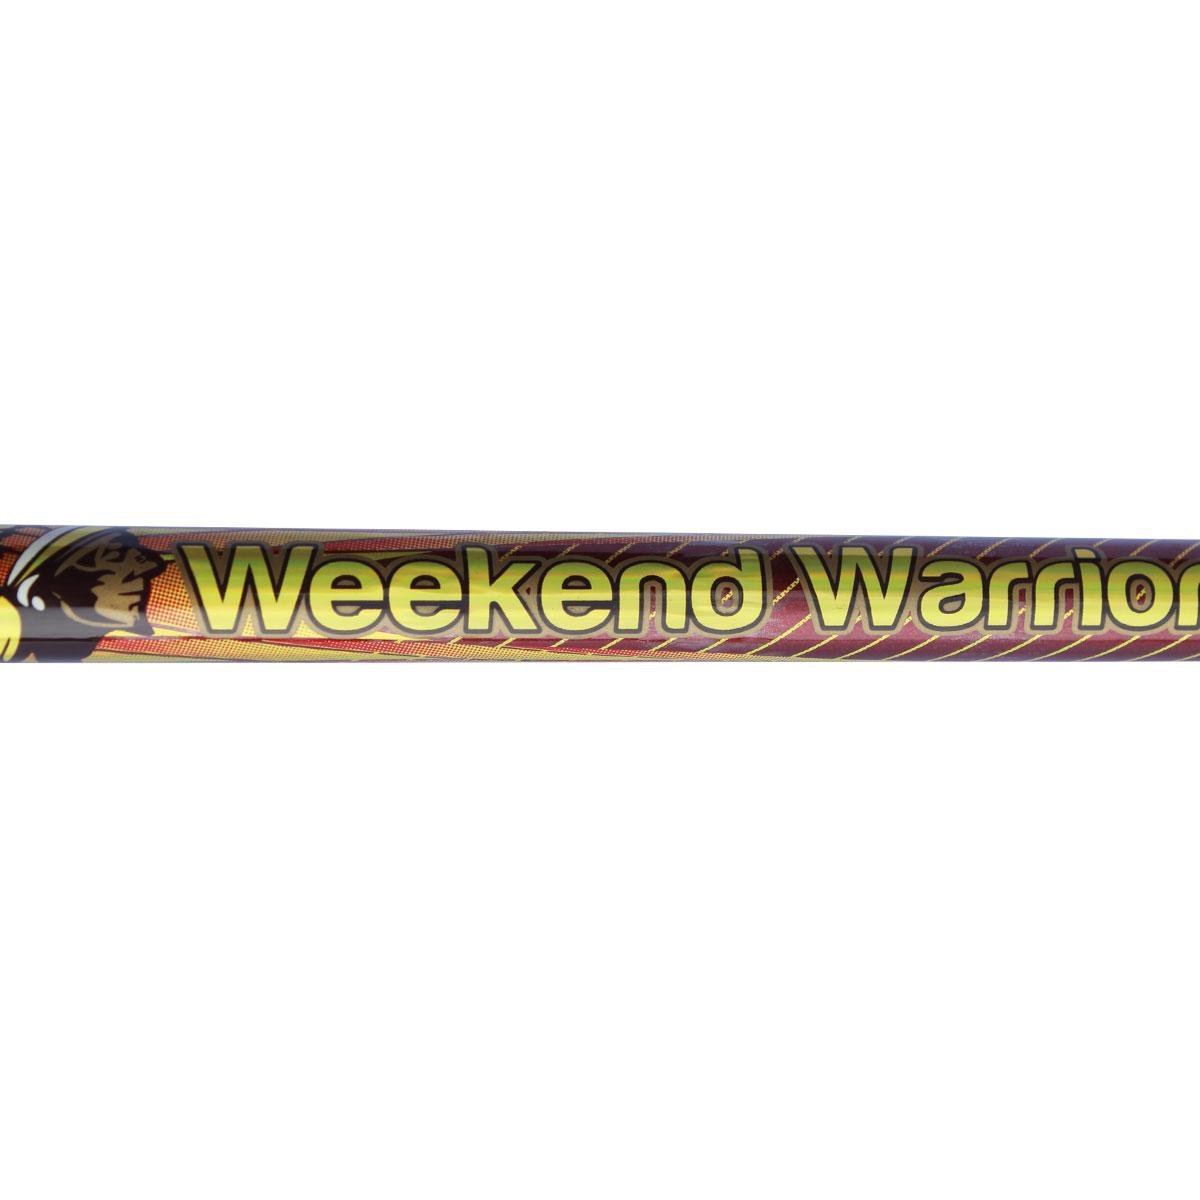 Cần Rút Pioneer Weekend Warrior 2105Cần Câu Cá Phổ Thông